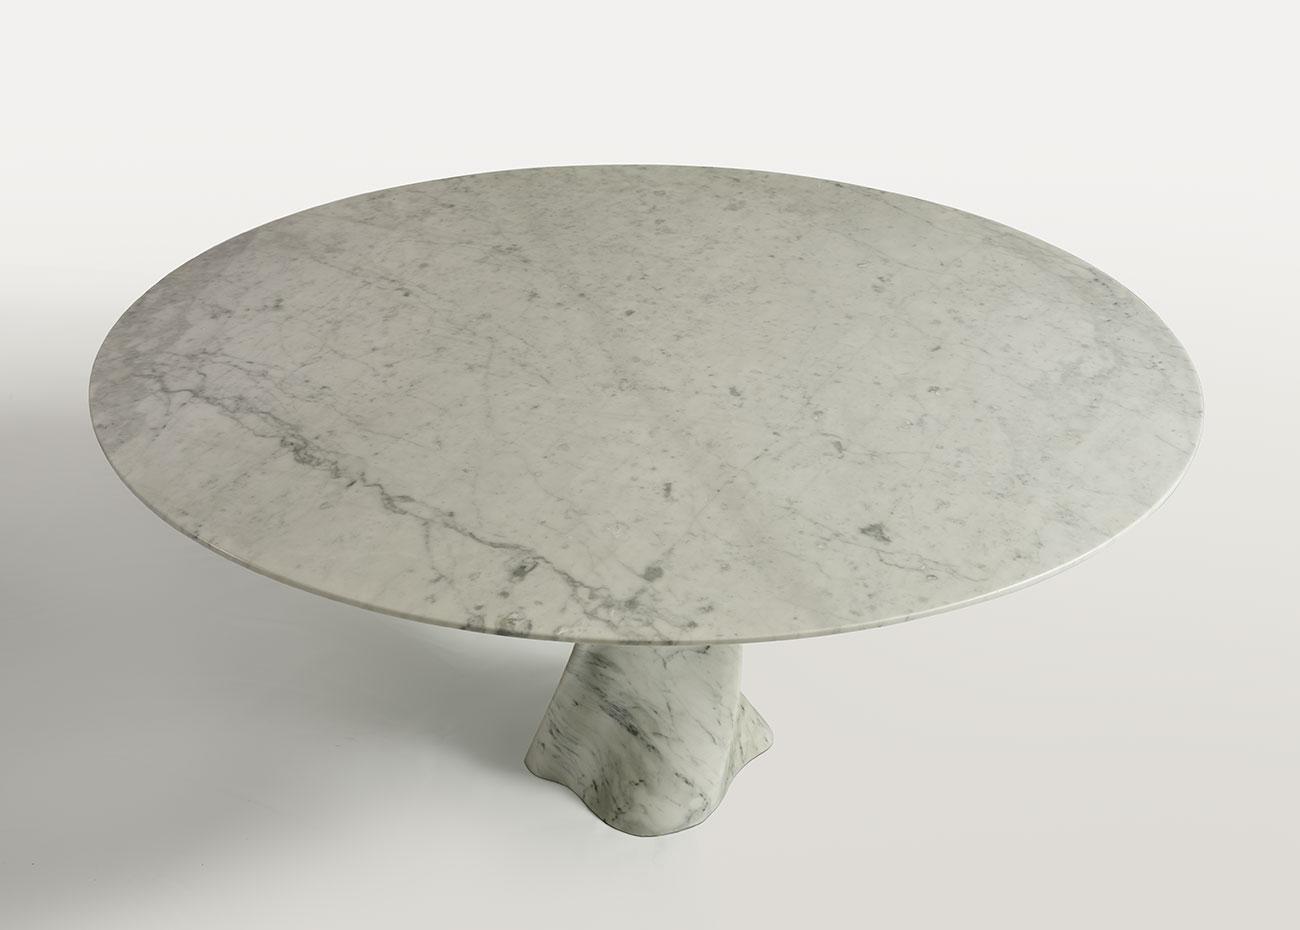 tavolo-in-marmo-twist-mgm-la-marmoteca